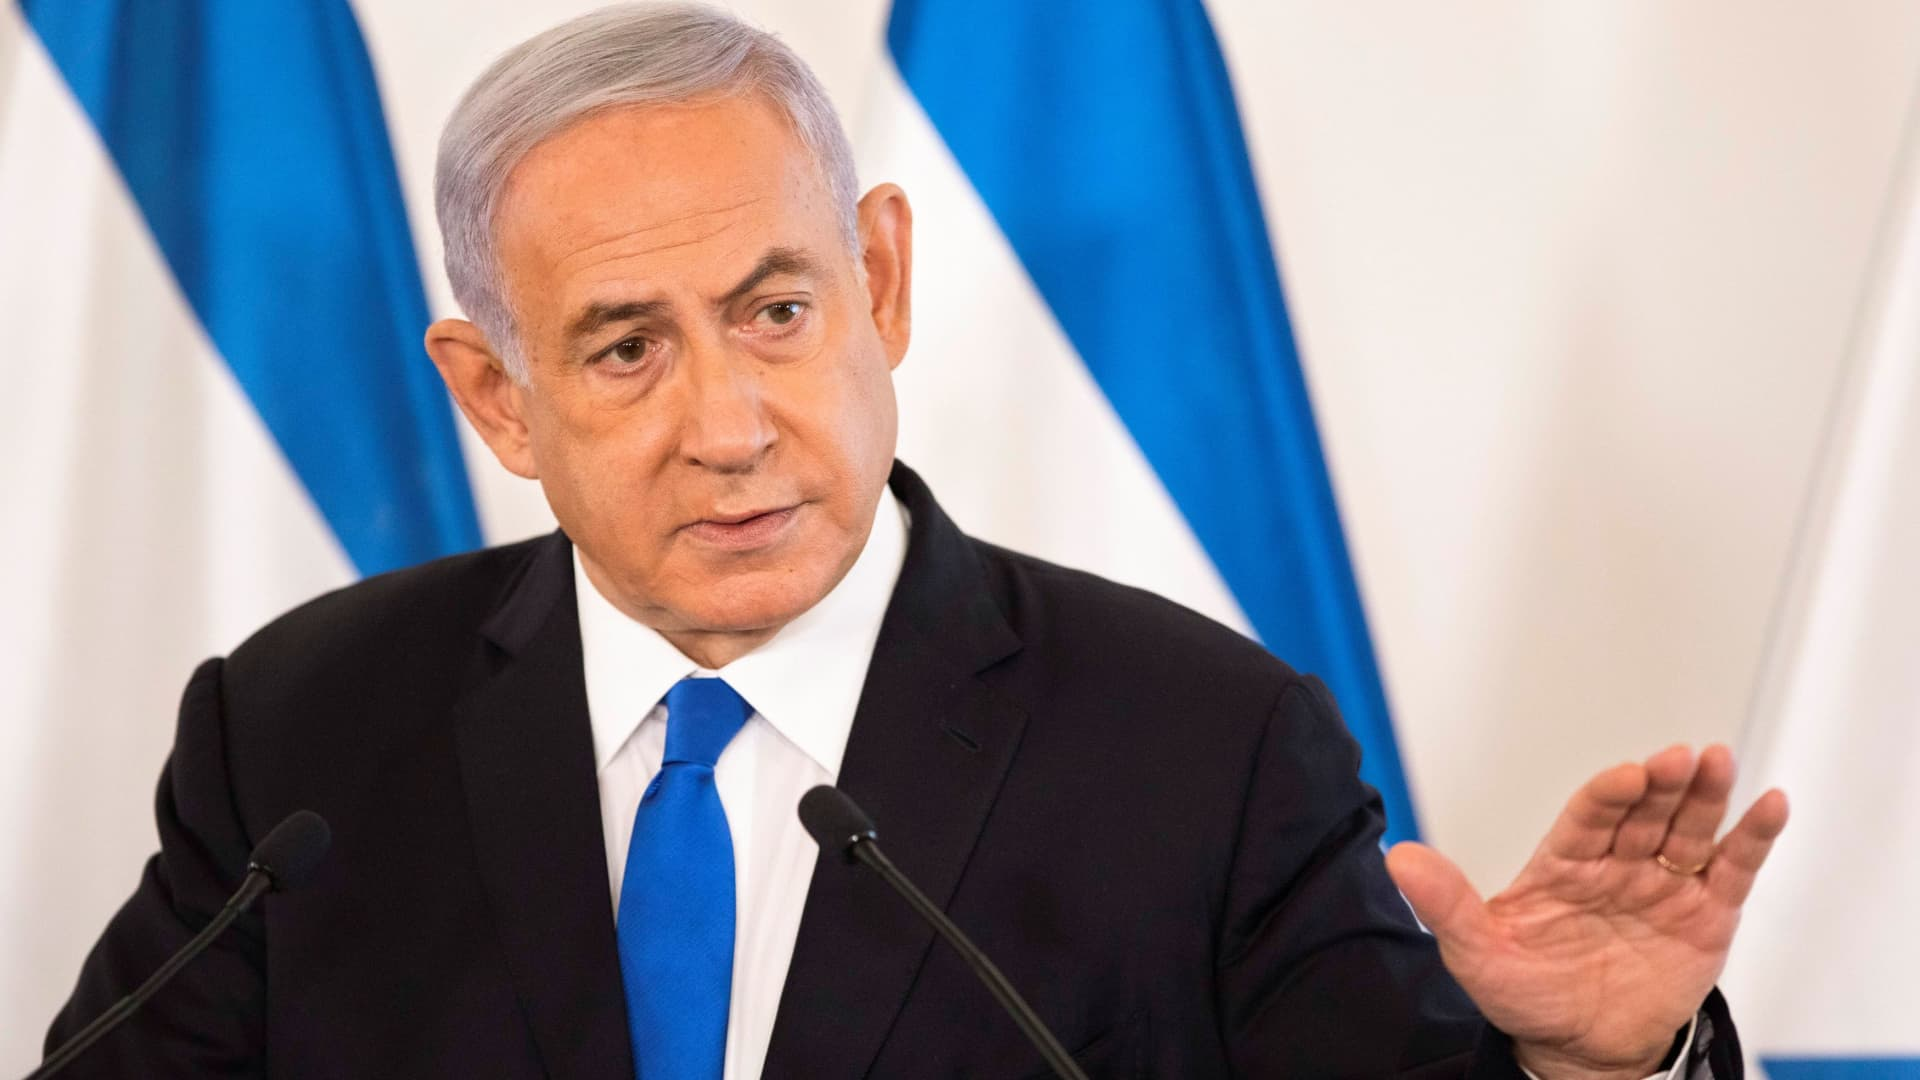 Israeli Prime Minister Benjamin Netanyahu gestures as he speaks during a briefing to ambassadors to Israel at a military base in Tel Aviv, Israel May 19, 2021.